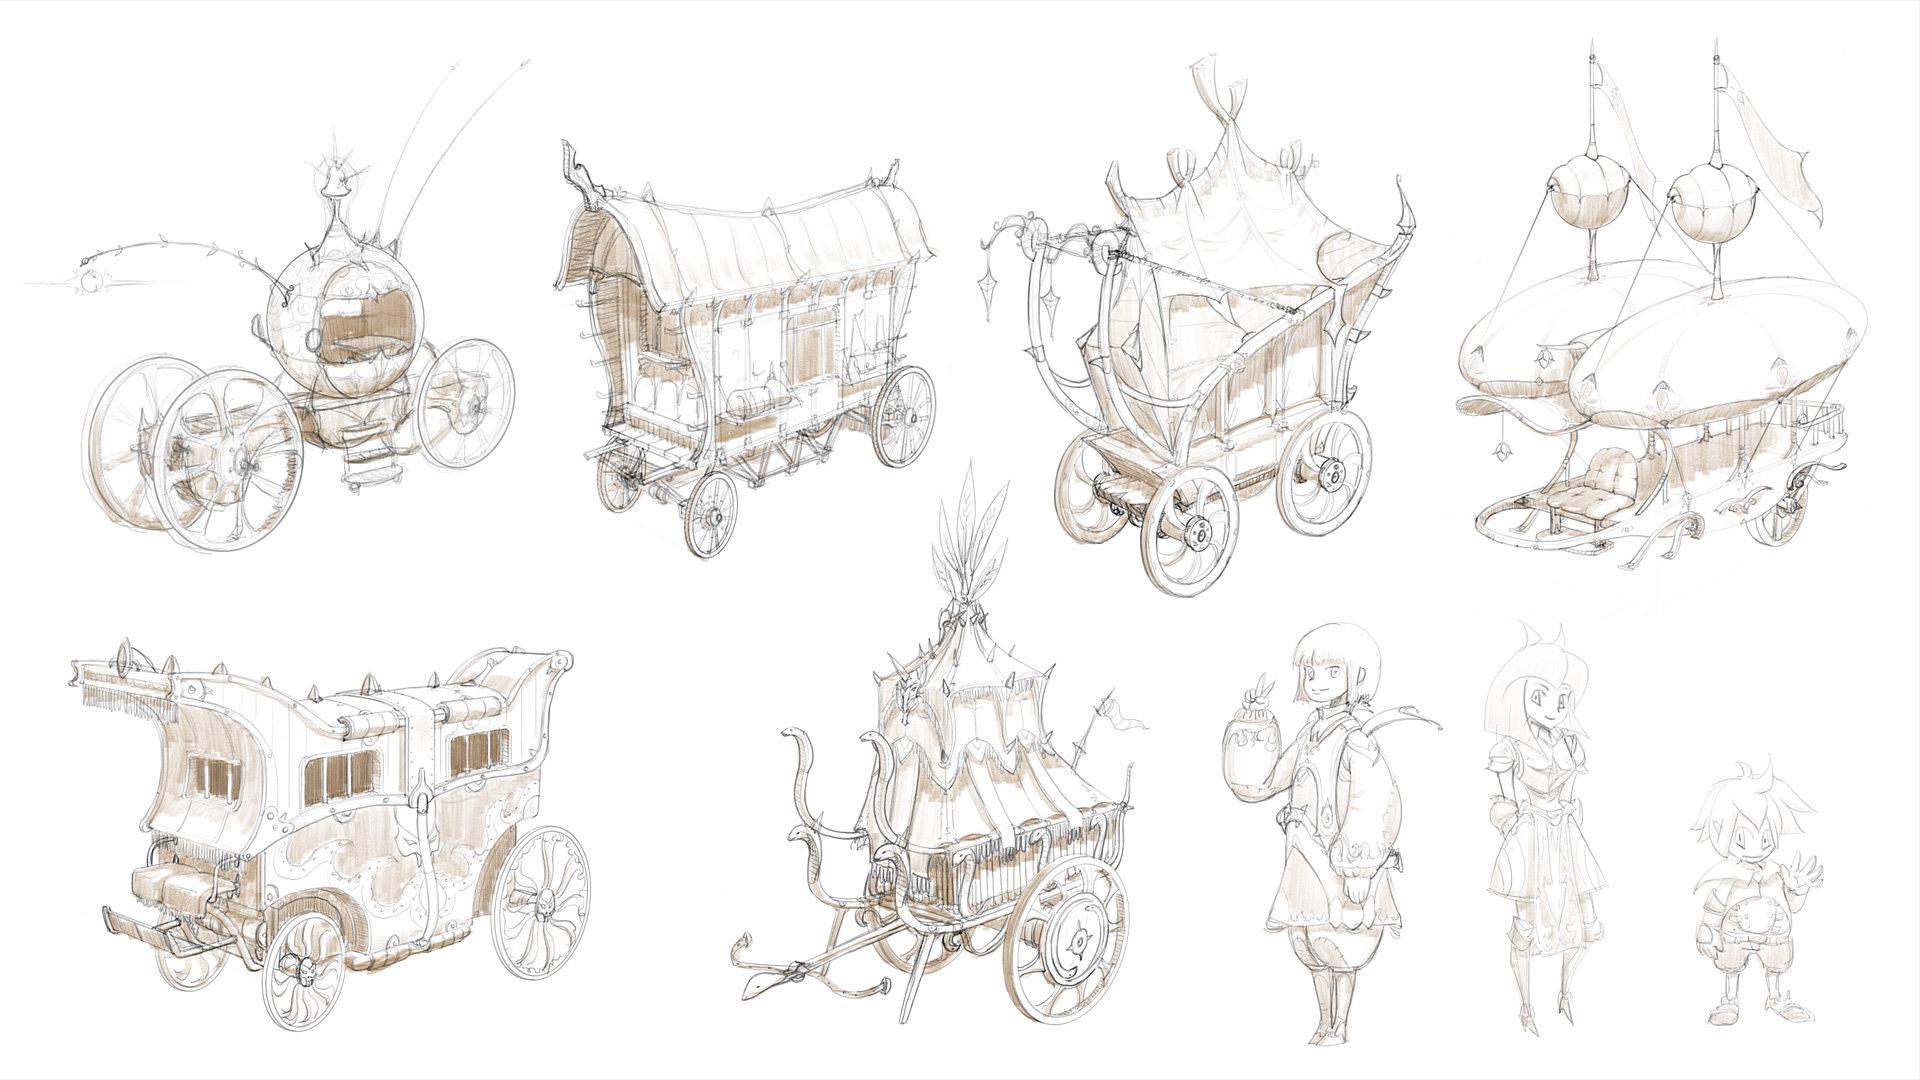 Republic of iaki fantasy carriage sketch